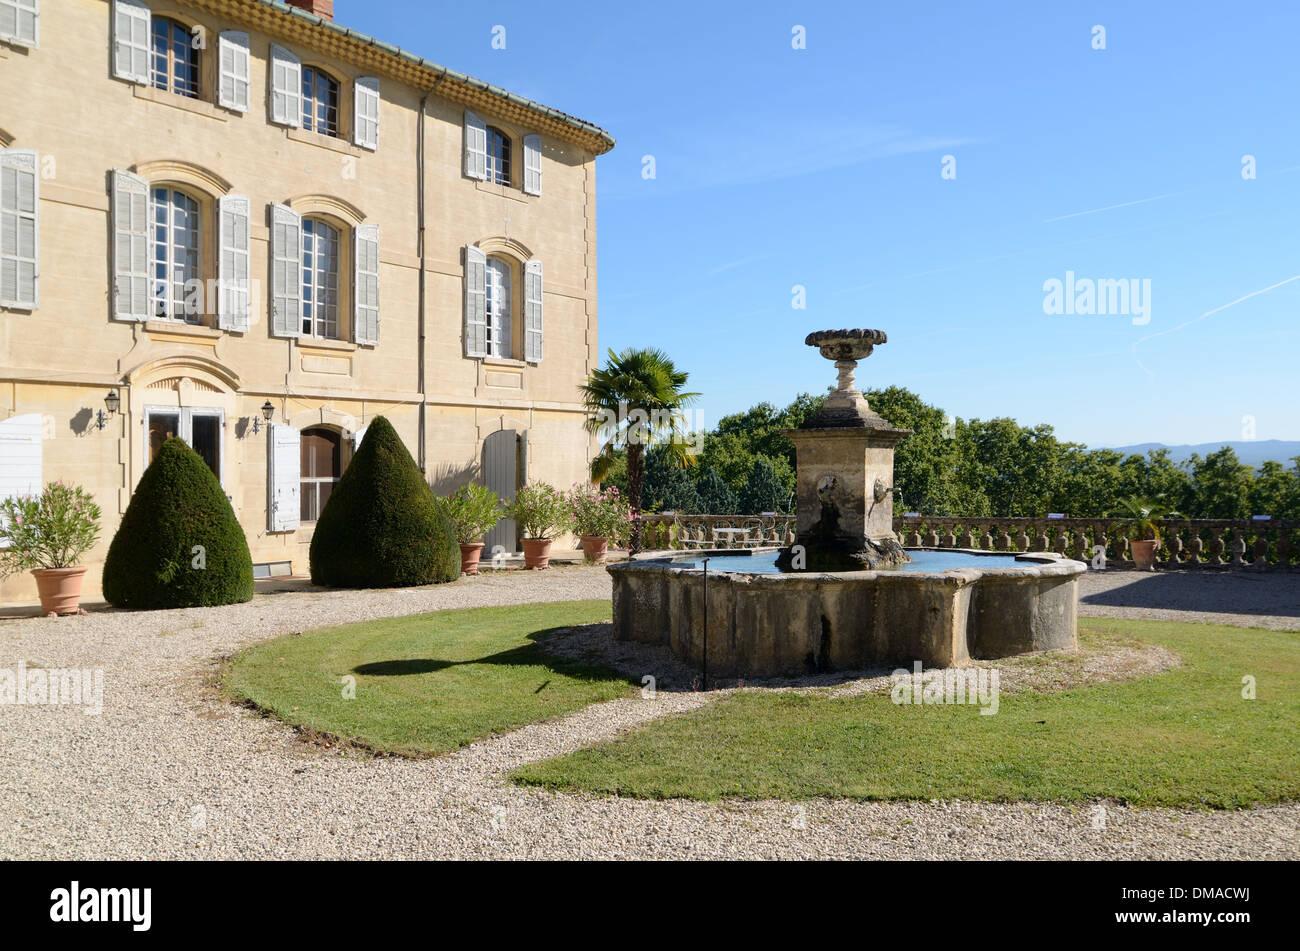 Château d'Arnajon Bastide ou Country House Le Puy-Sainte-Réparade Provence France Photo Stock